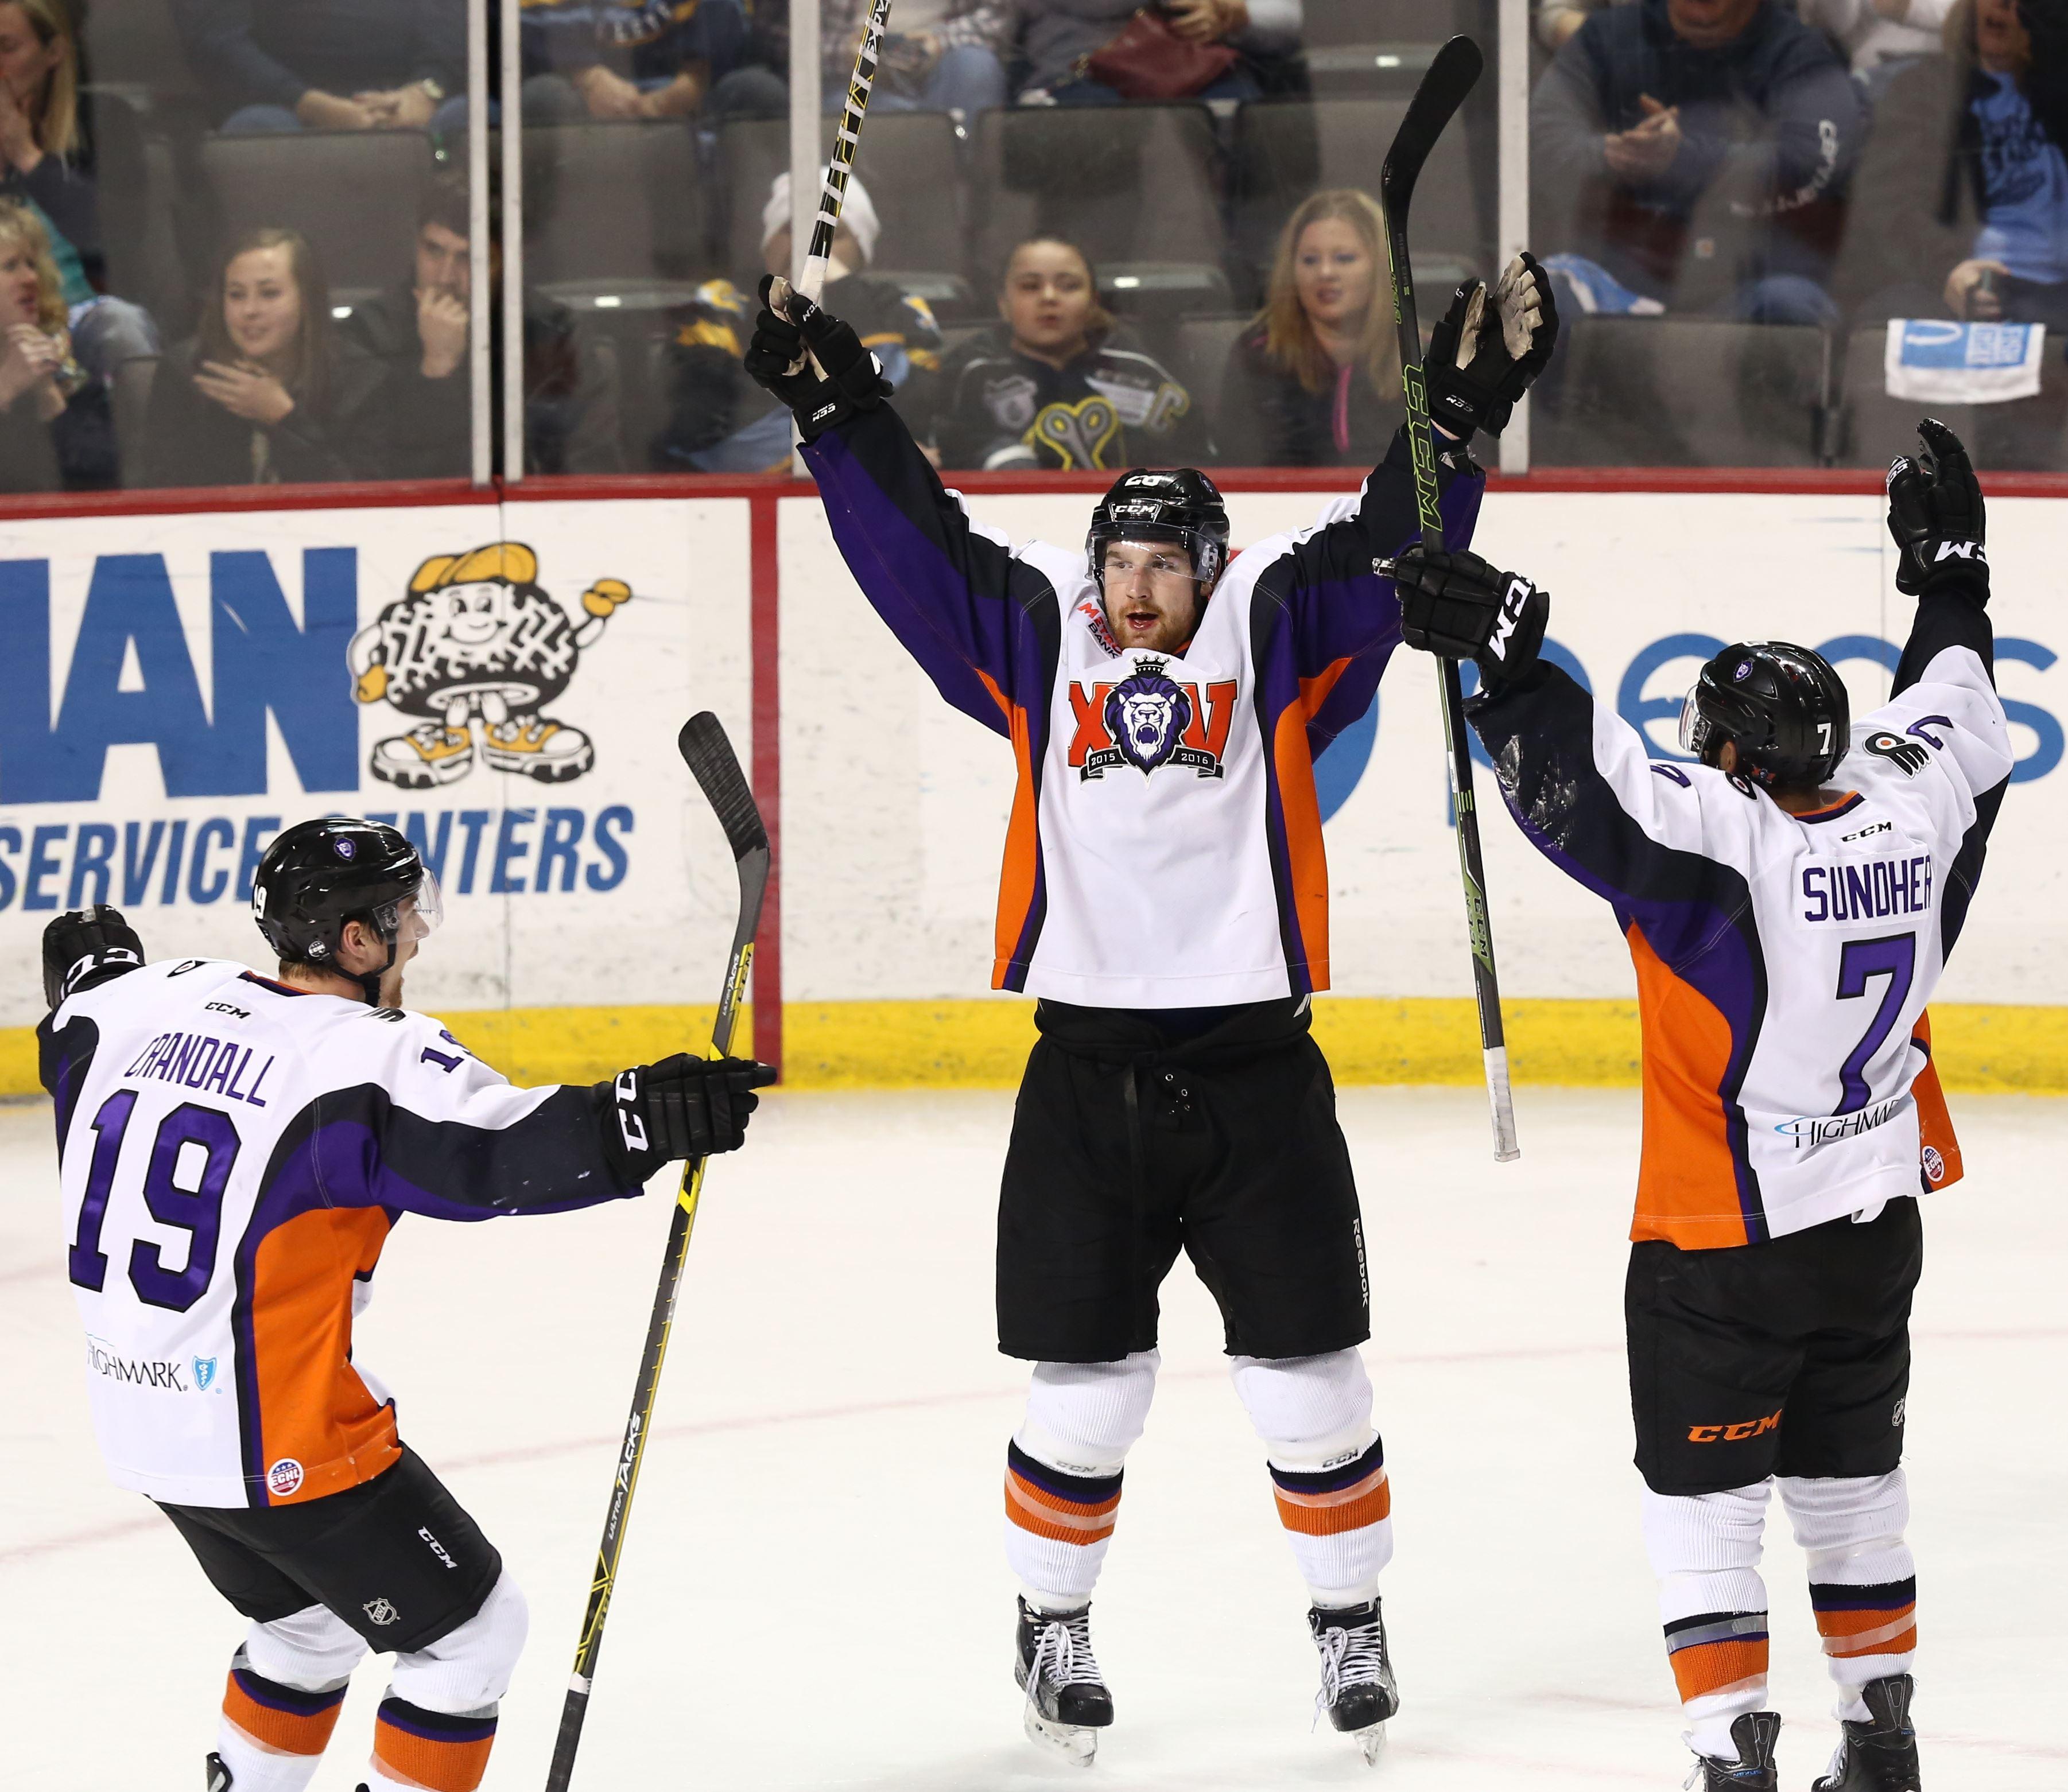 ECHL: Momentum Lost